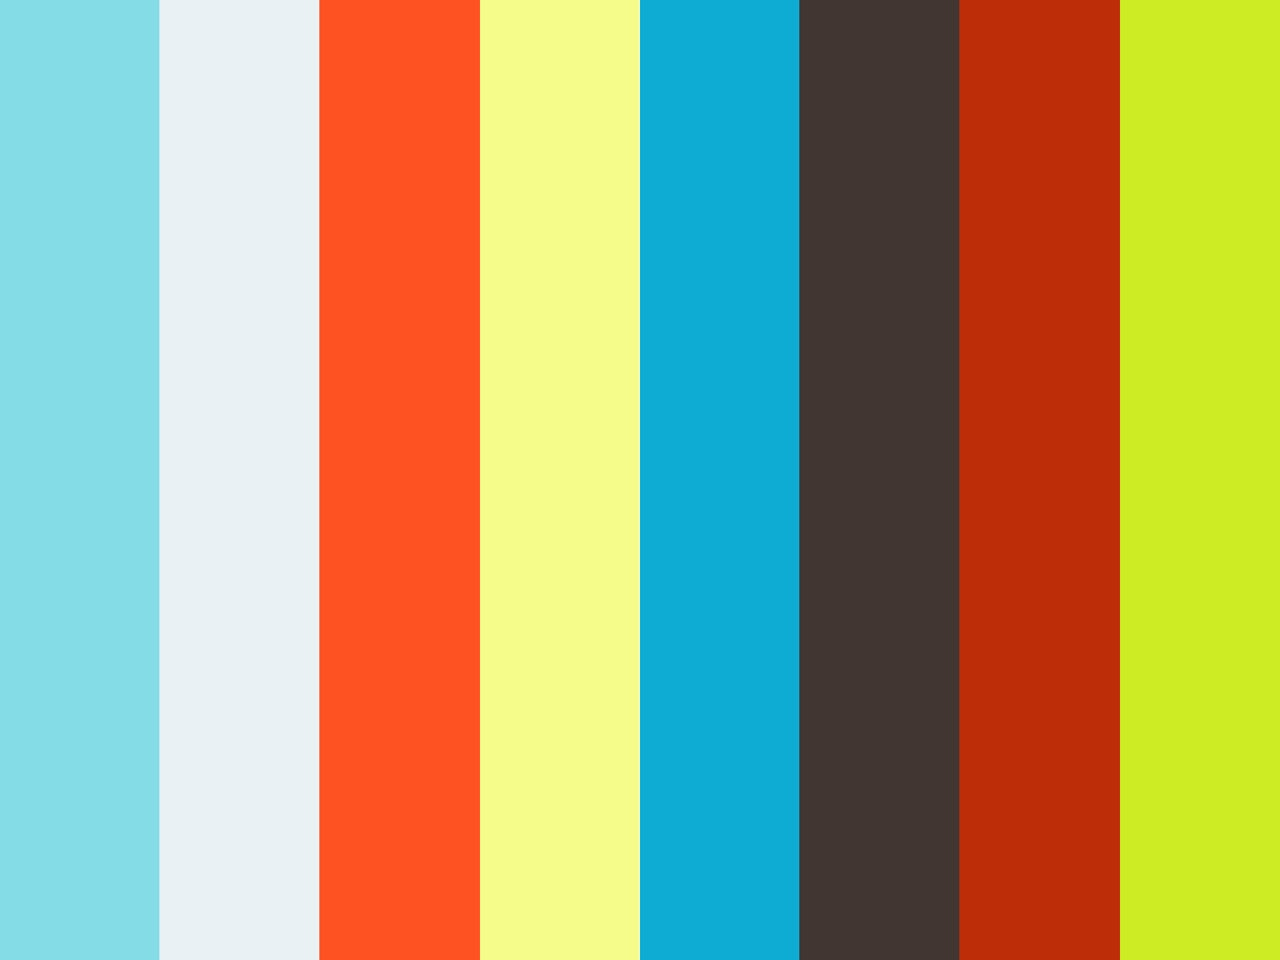 stripes excites